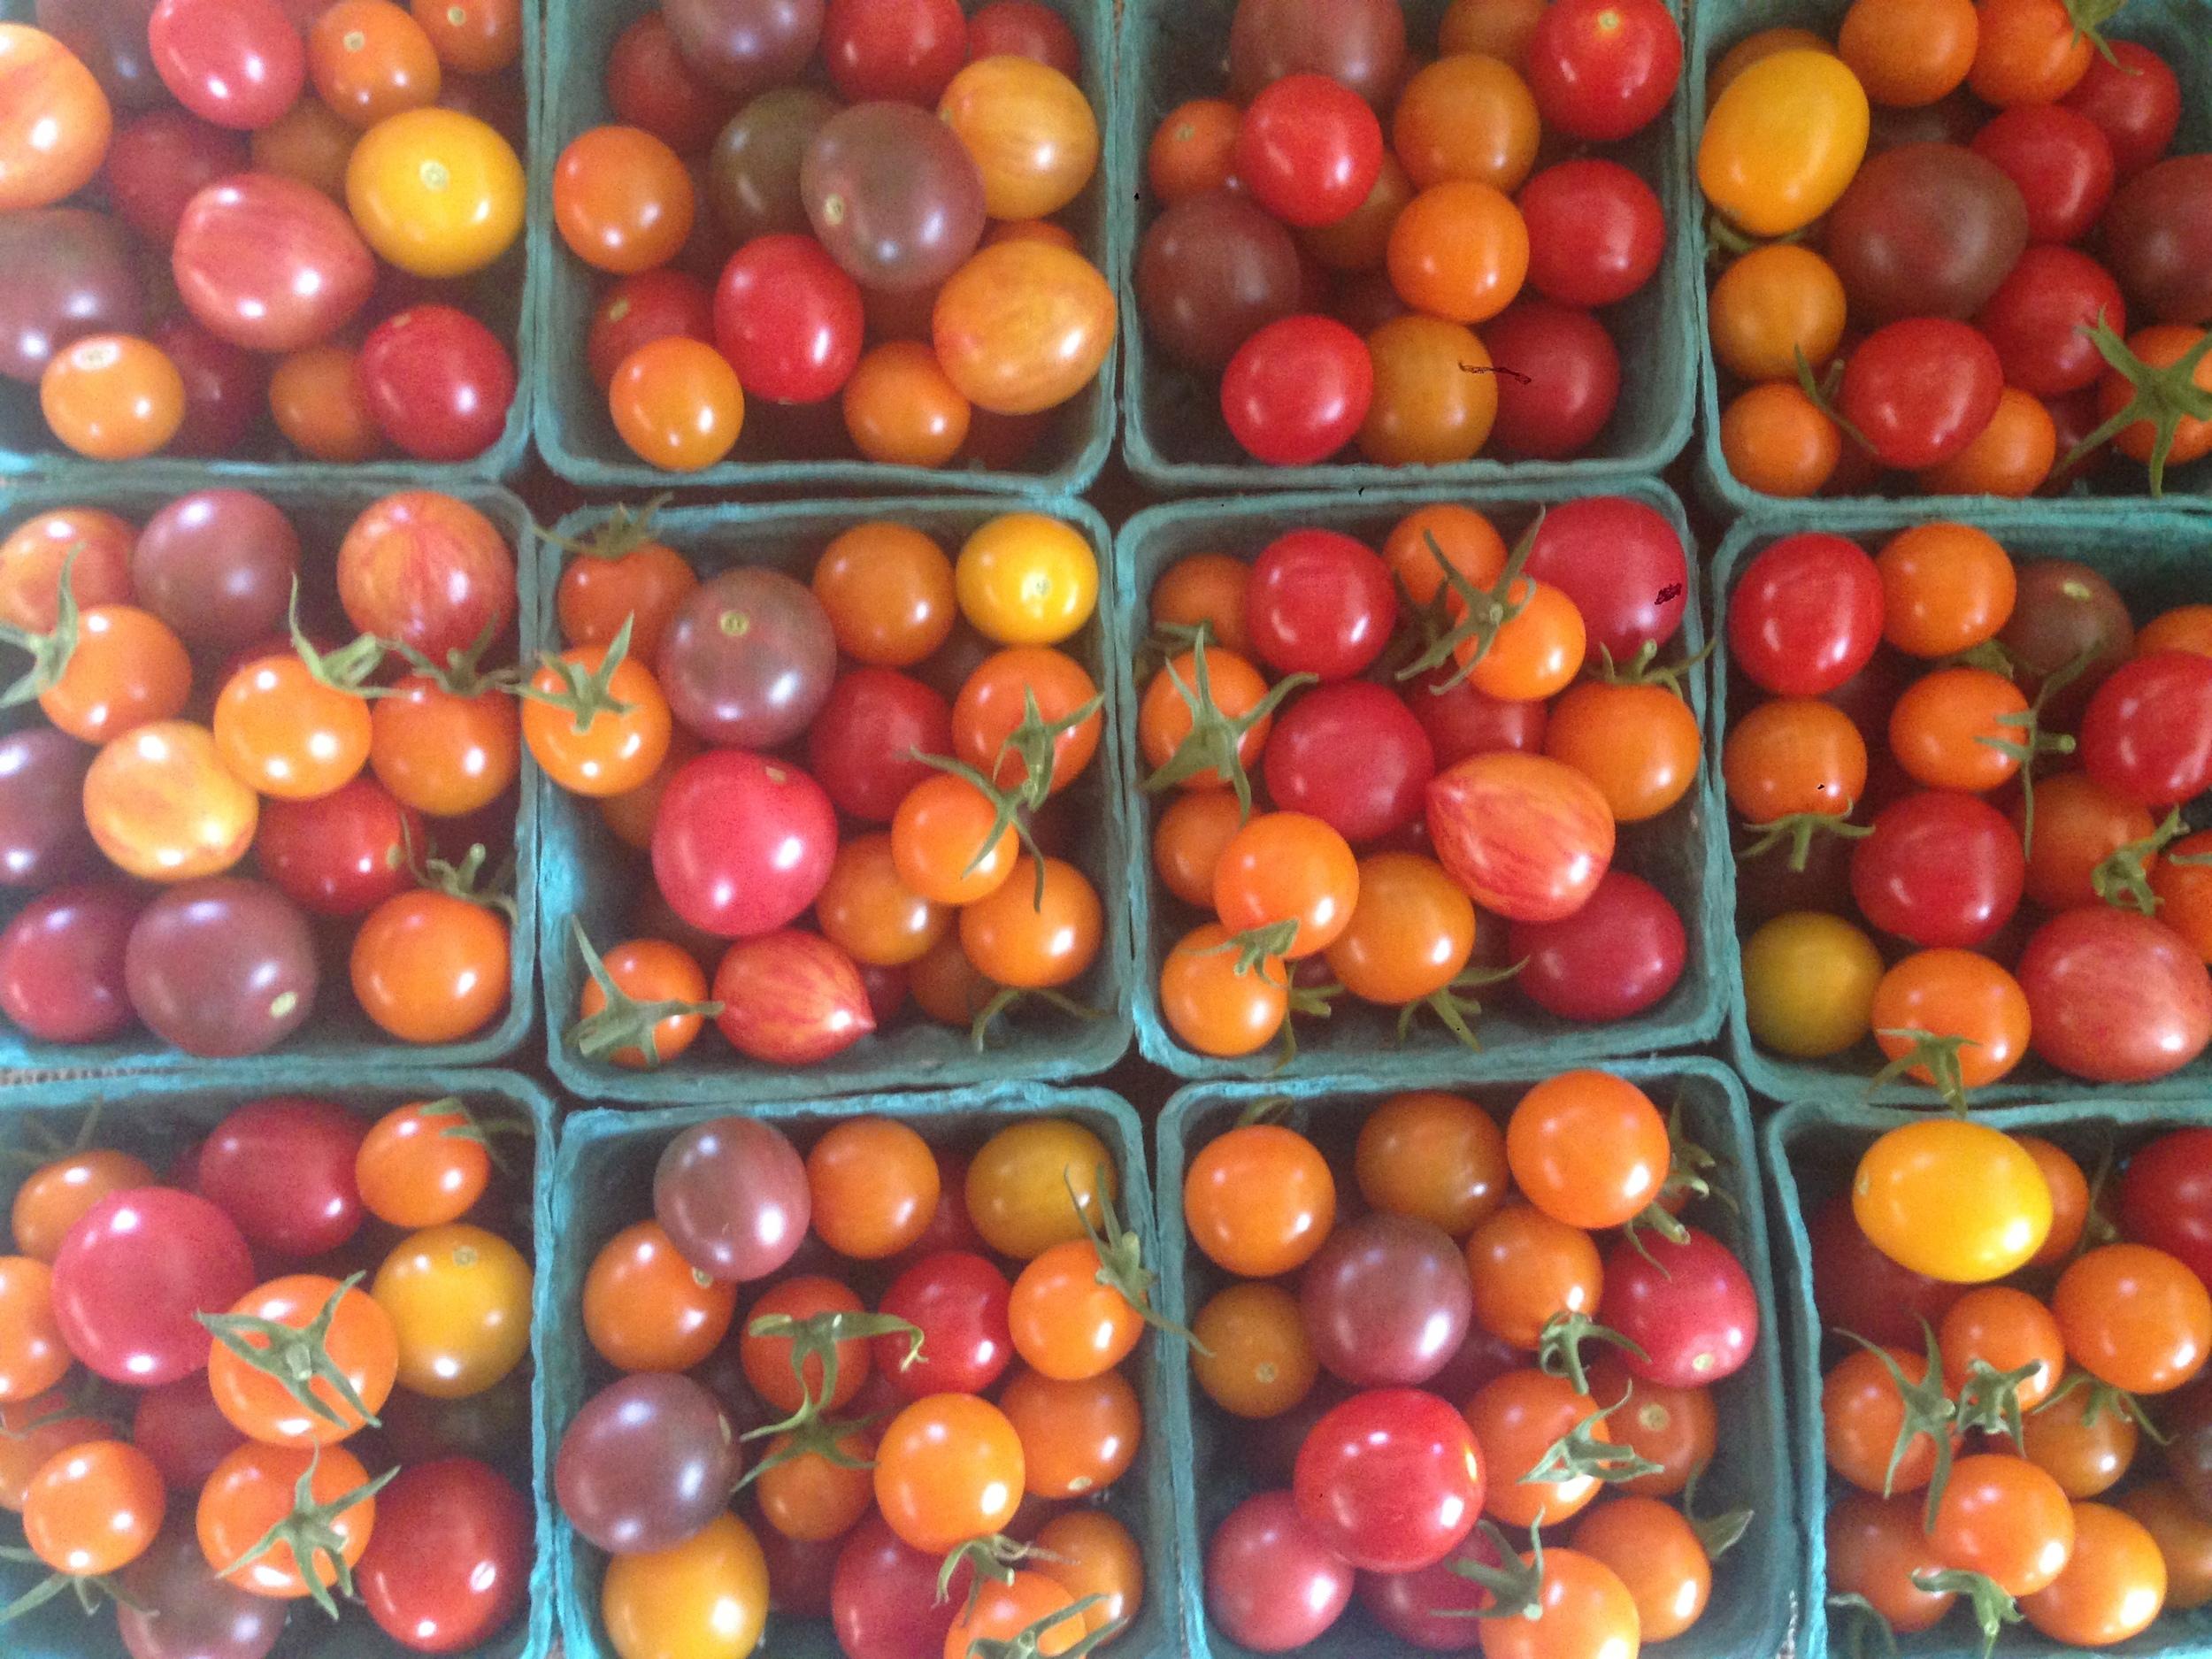 Rainbow of cherry tomatoes!